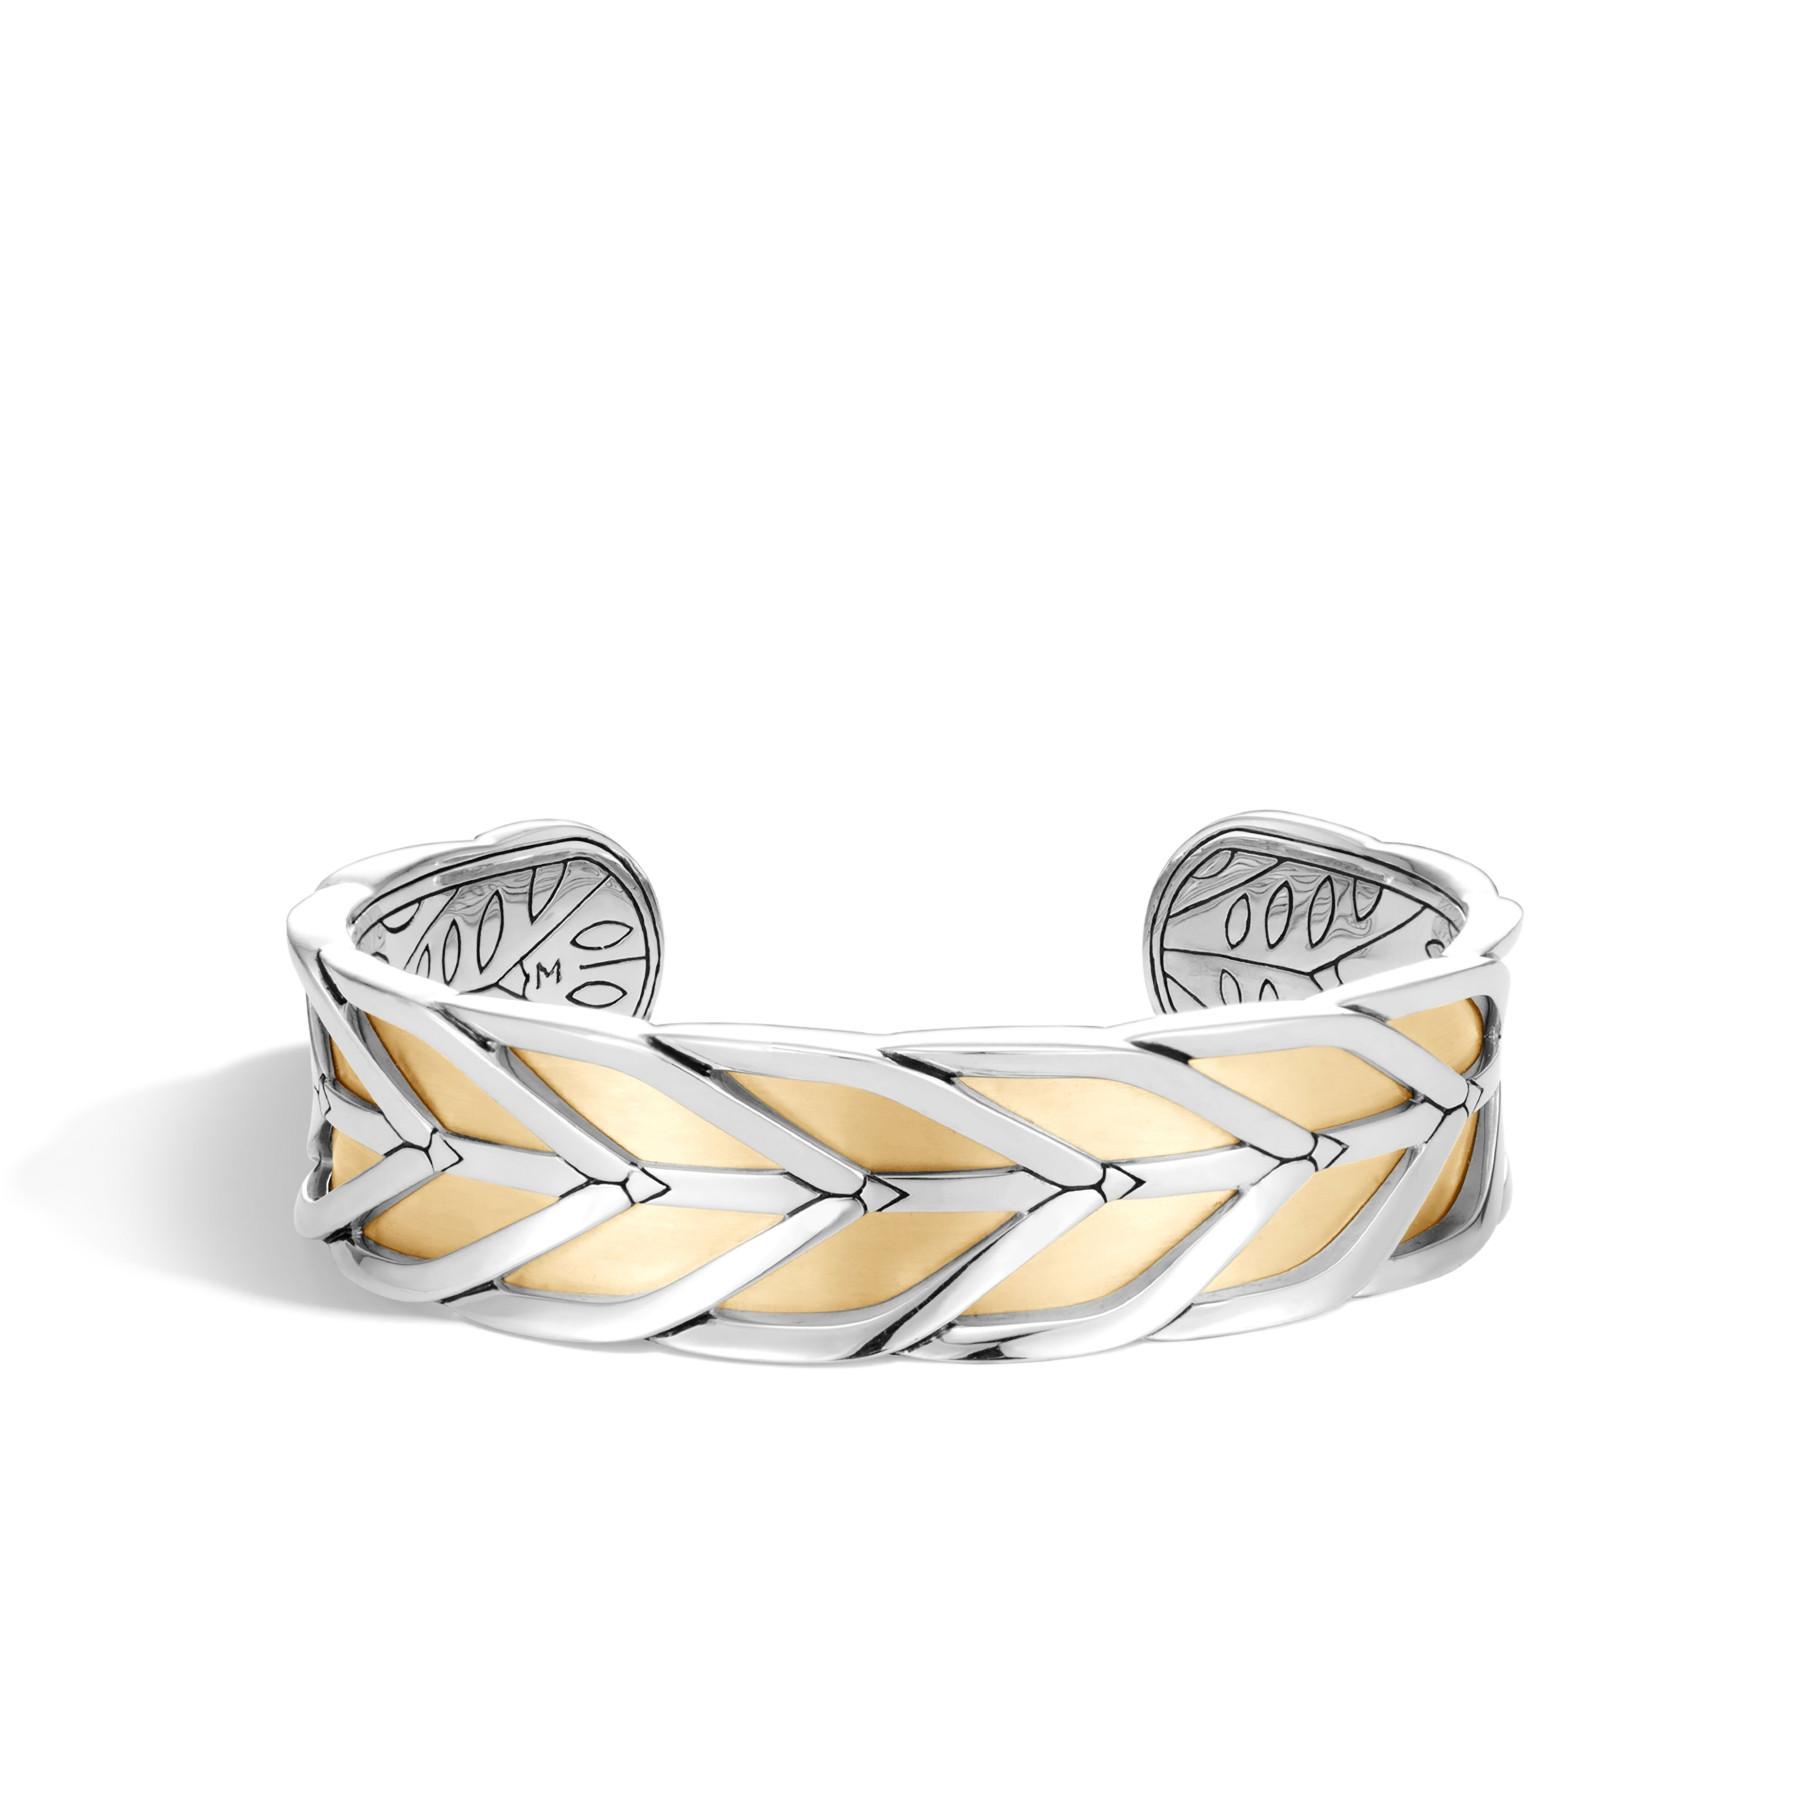 John Hardy Modern Chain Two-Tone Cuff Bracelet front view